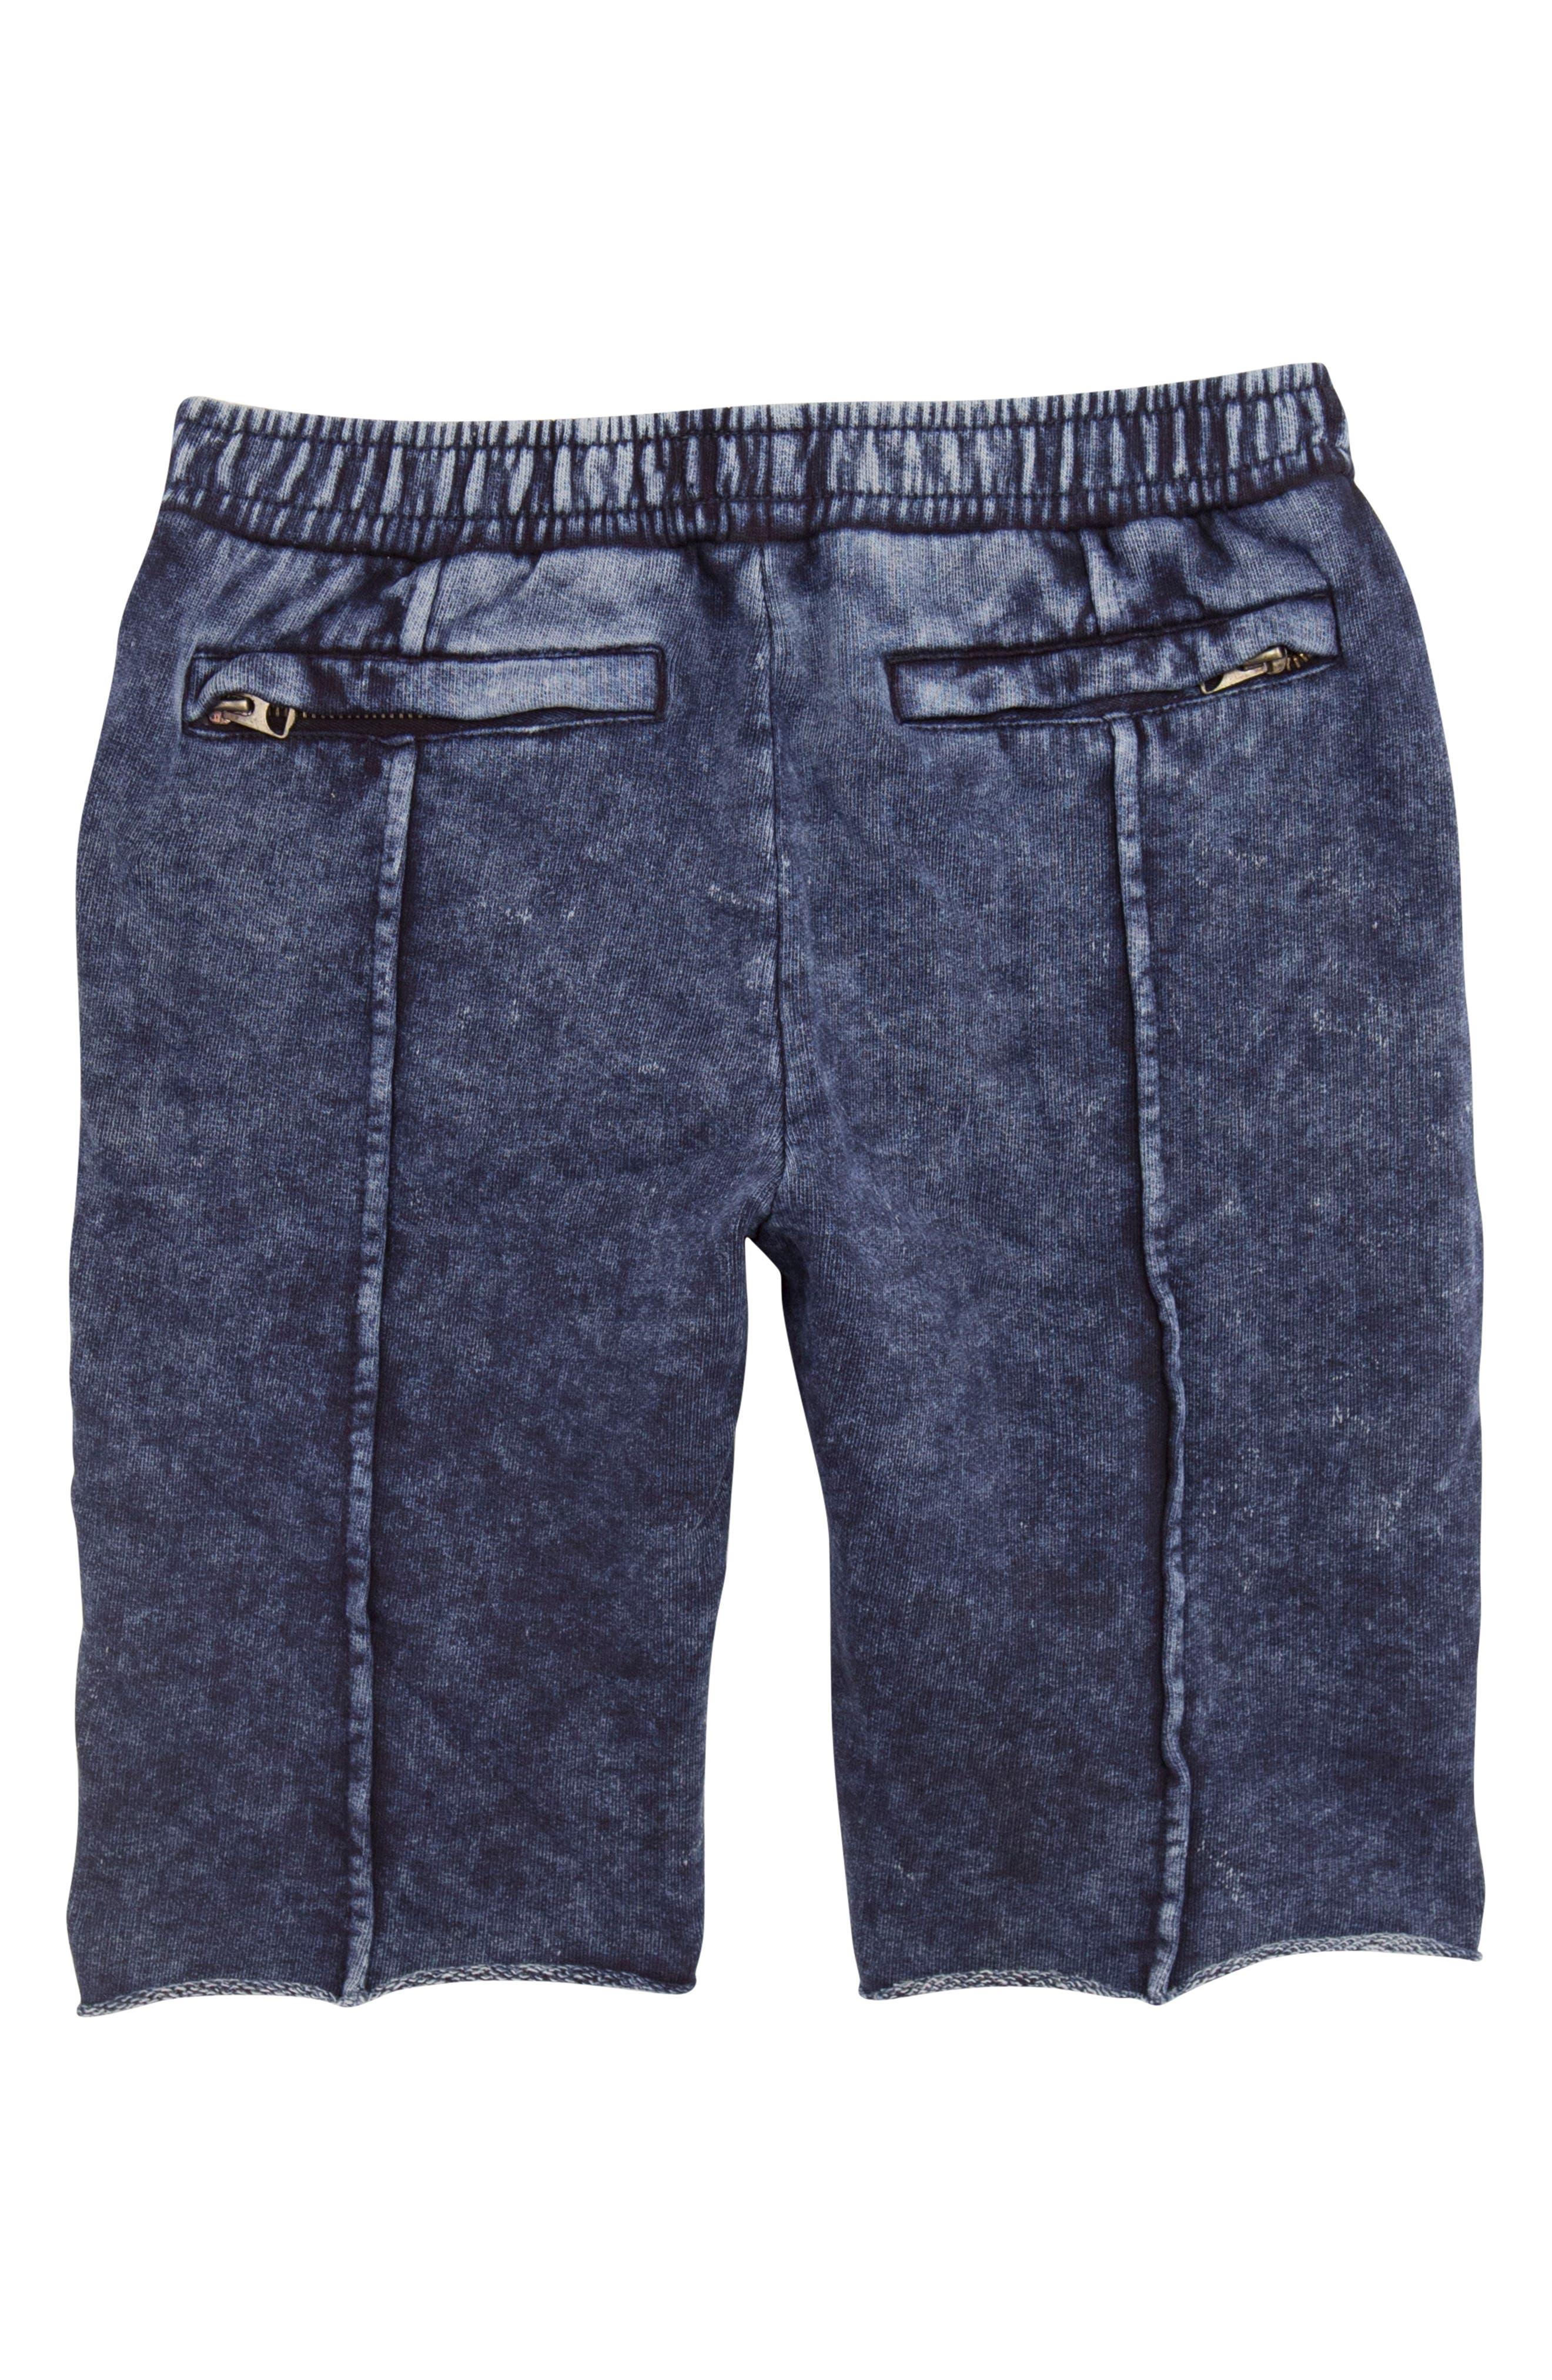 Acid Wash Pull-On Denim Shorts,                             Alternate thumbnail 3, color,                             Navy